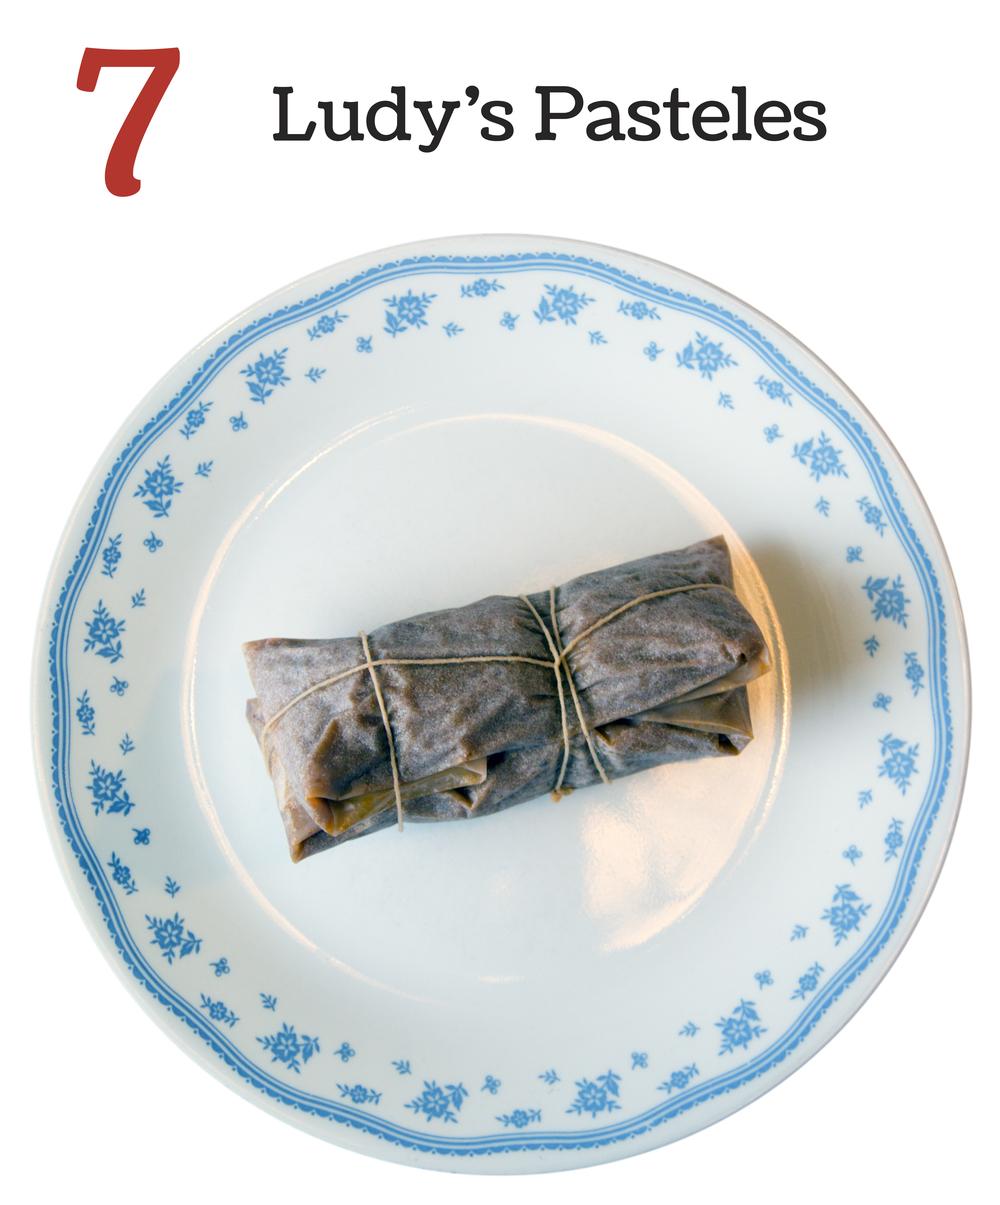 7 Ludy's Pasteles.jpg